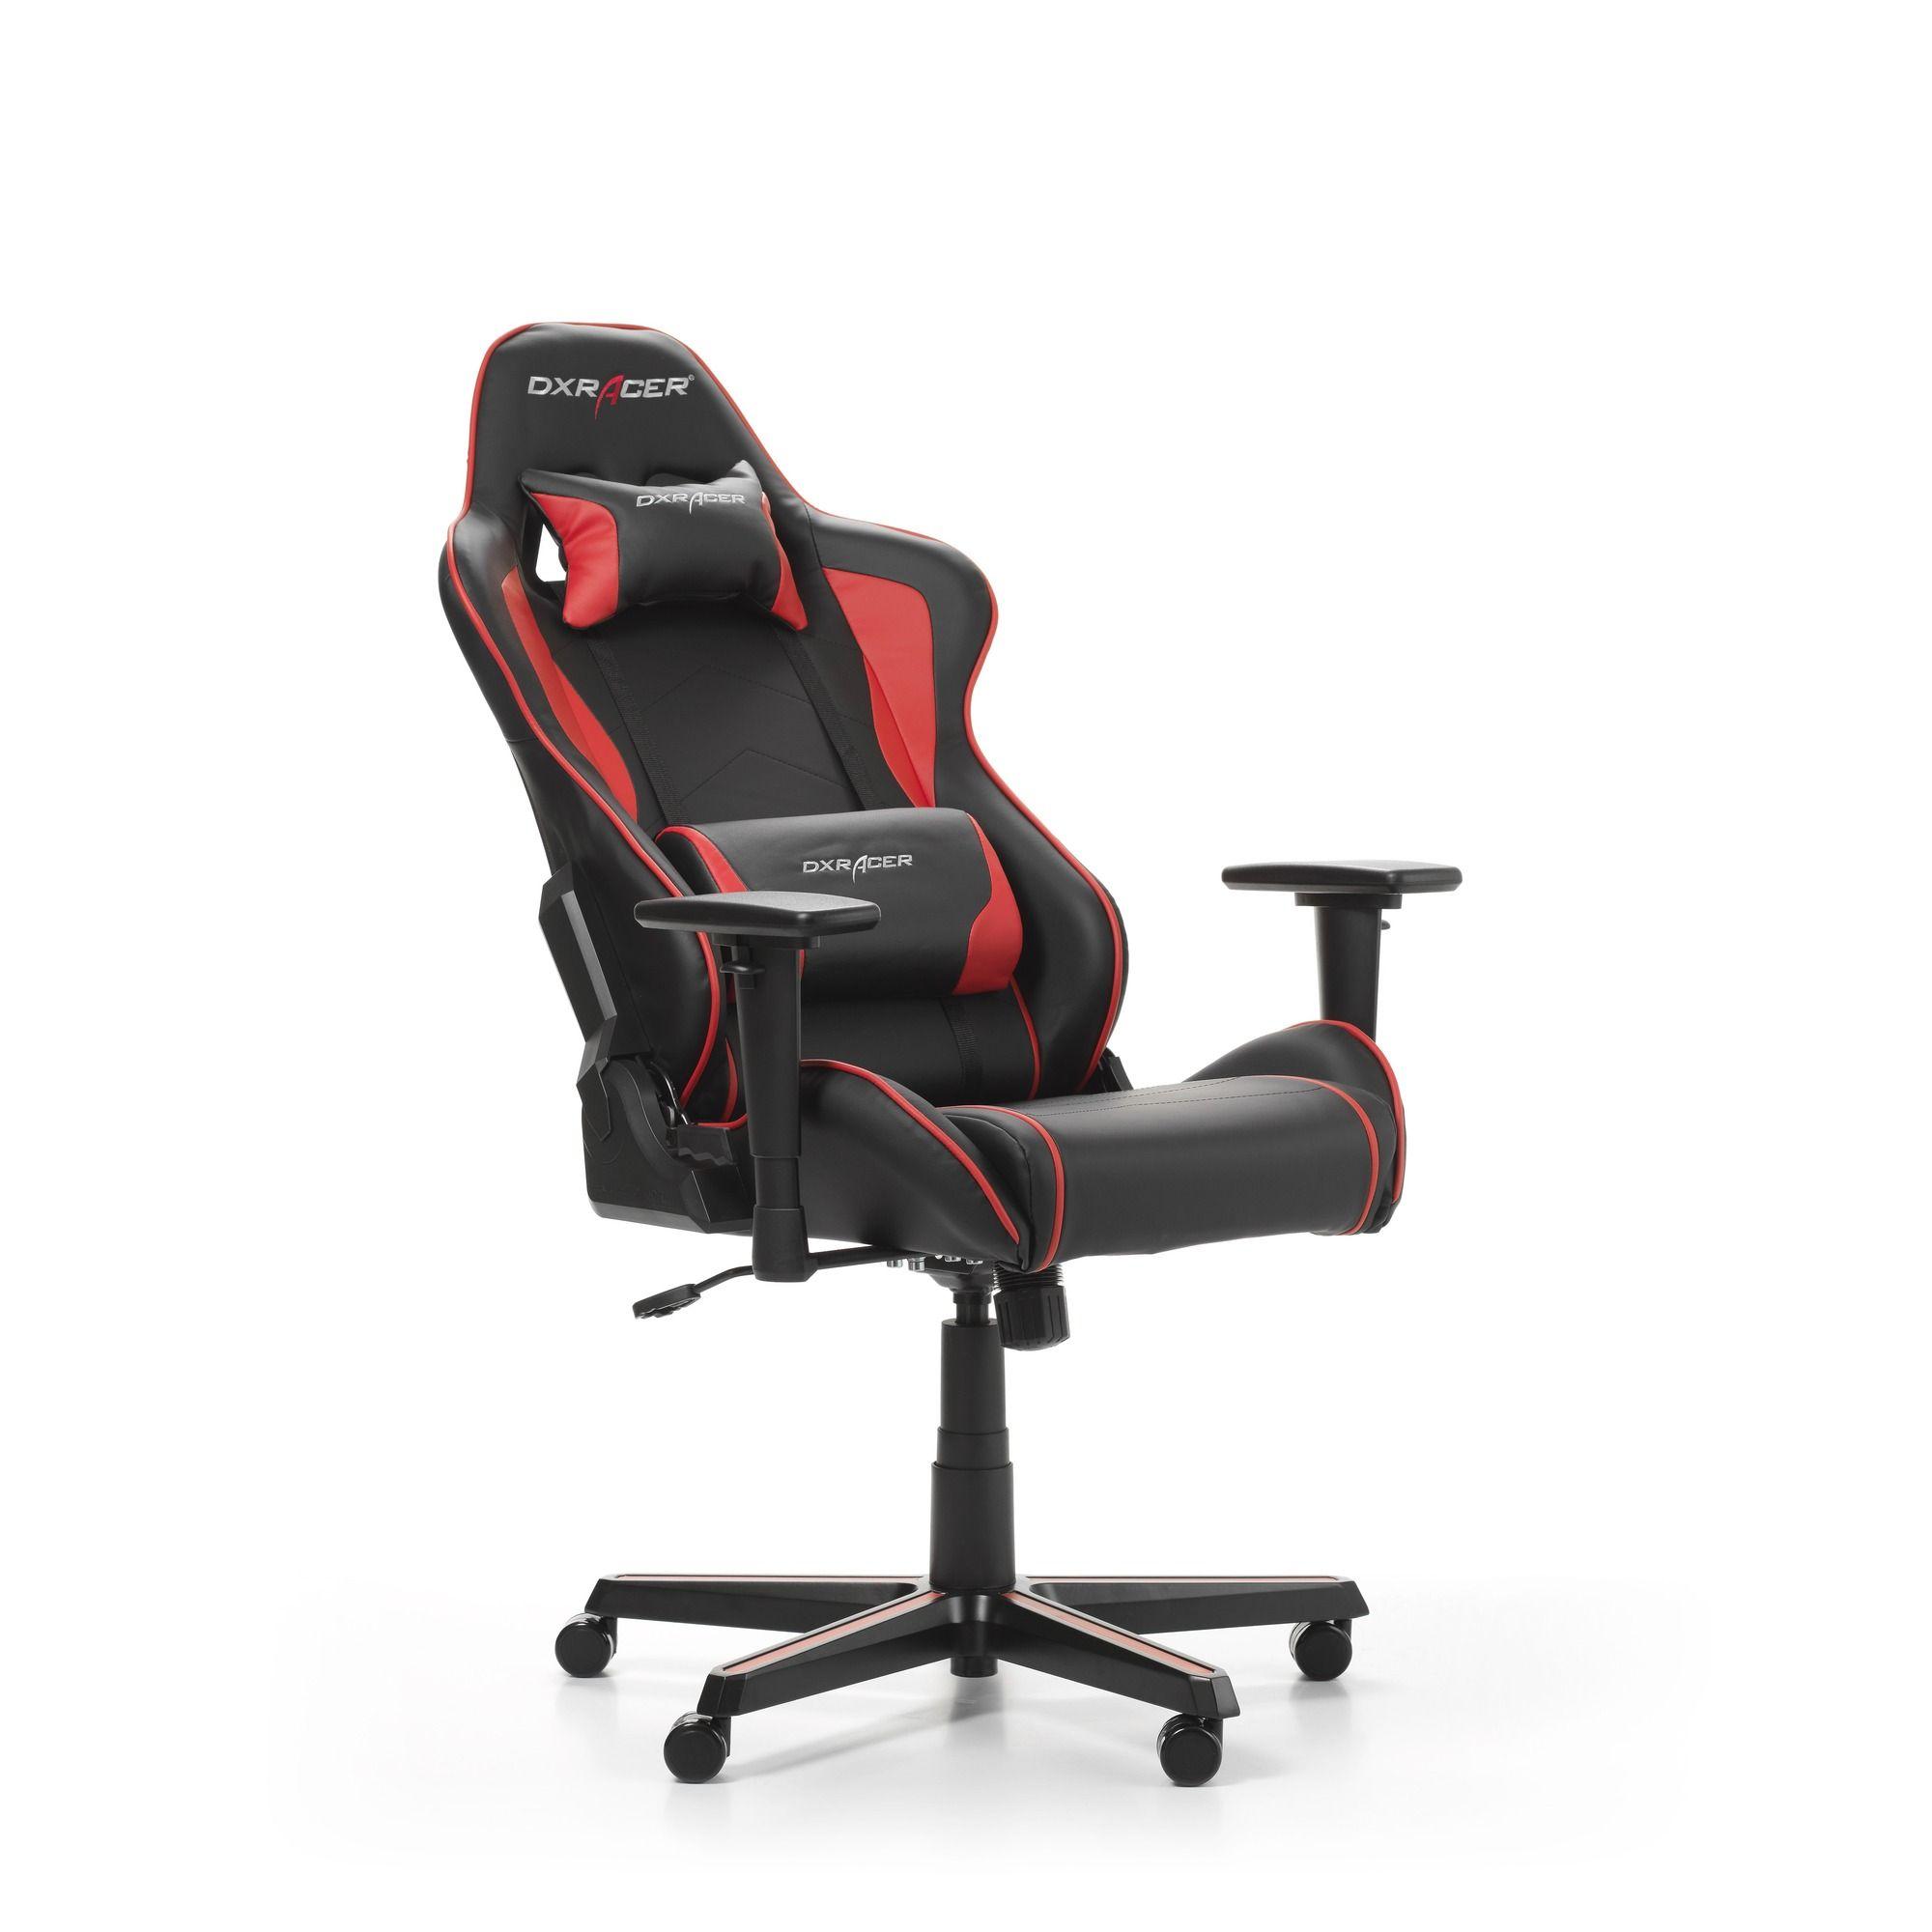 Гейминг стол DXRacer OH/FH08/NR - серия FORMULA, черен/червен - 2